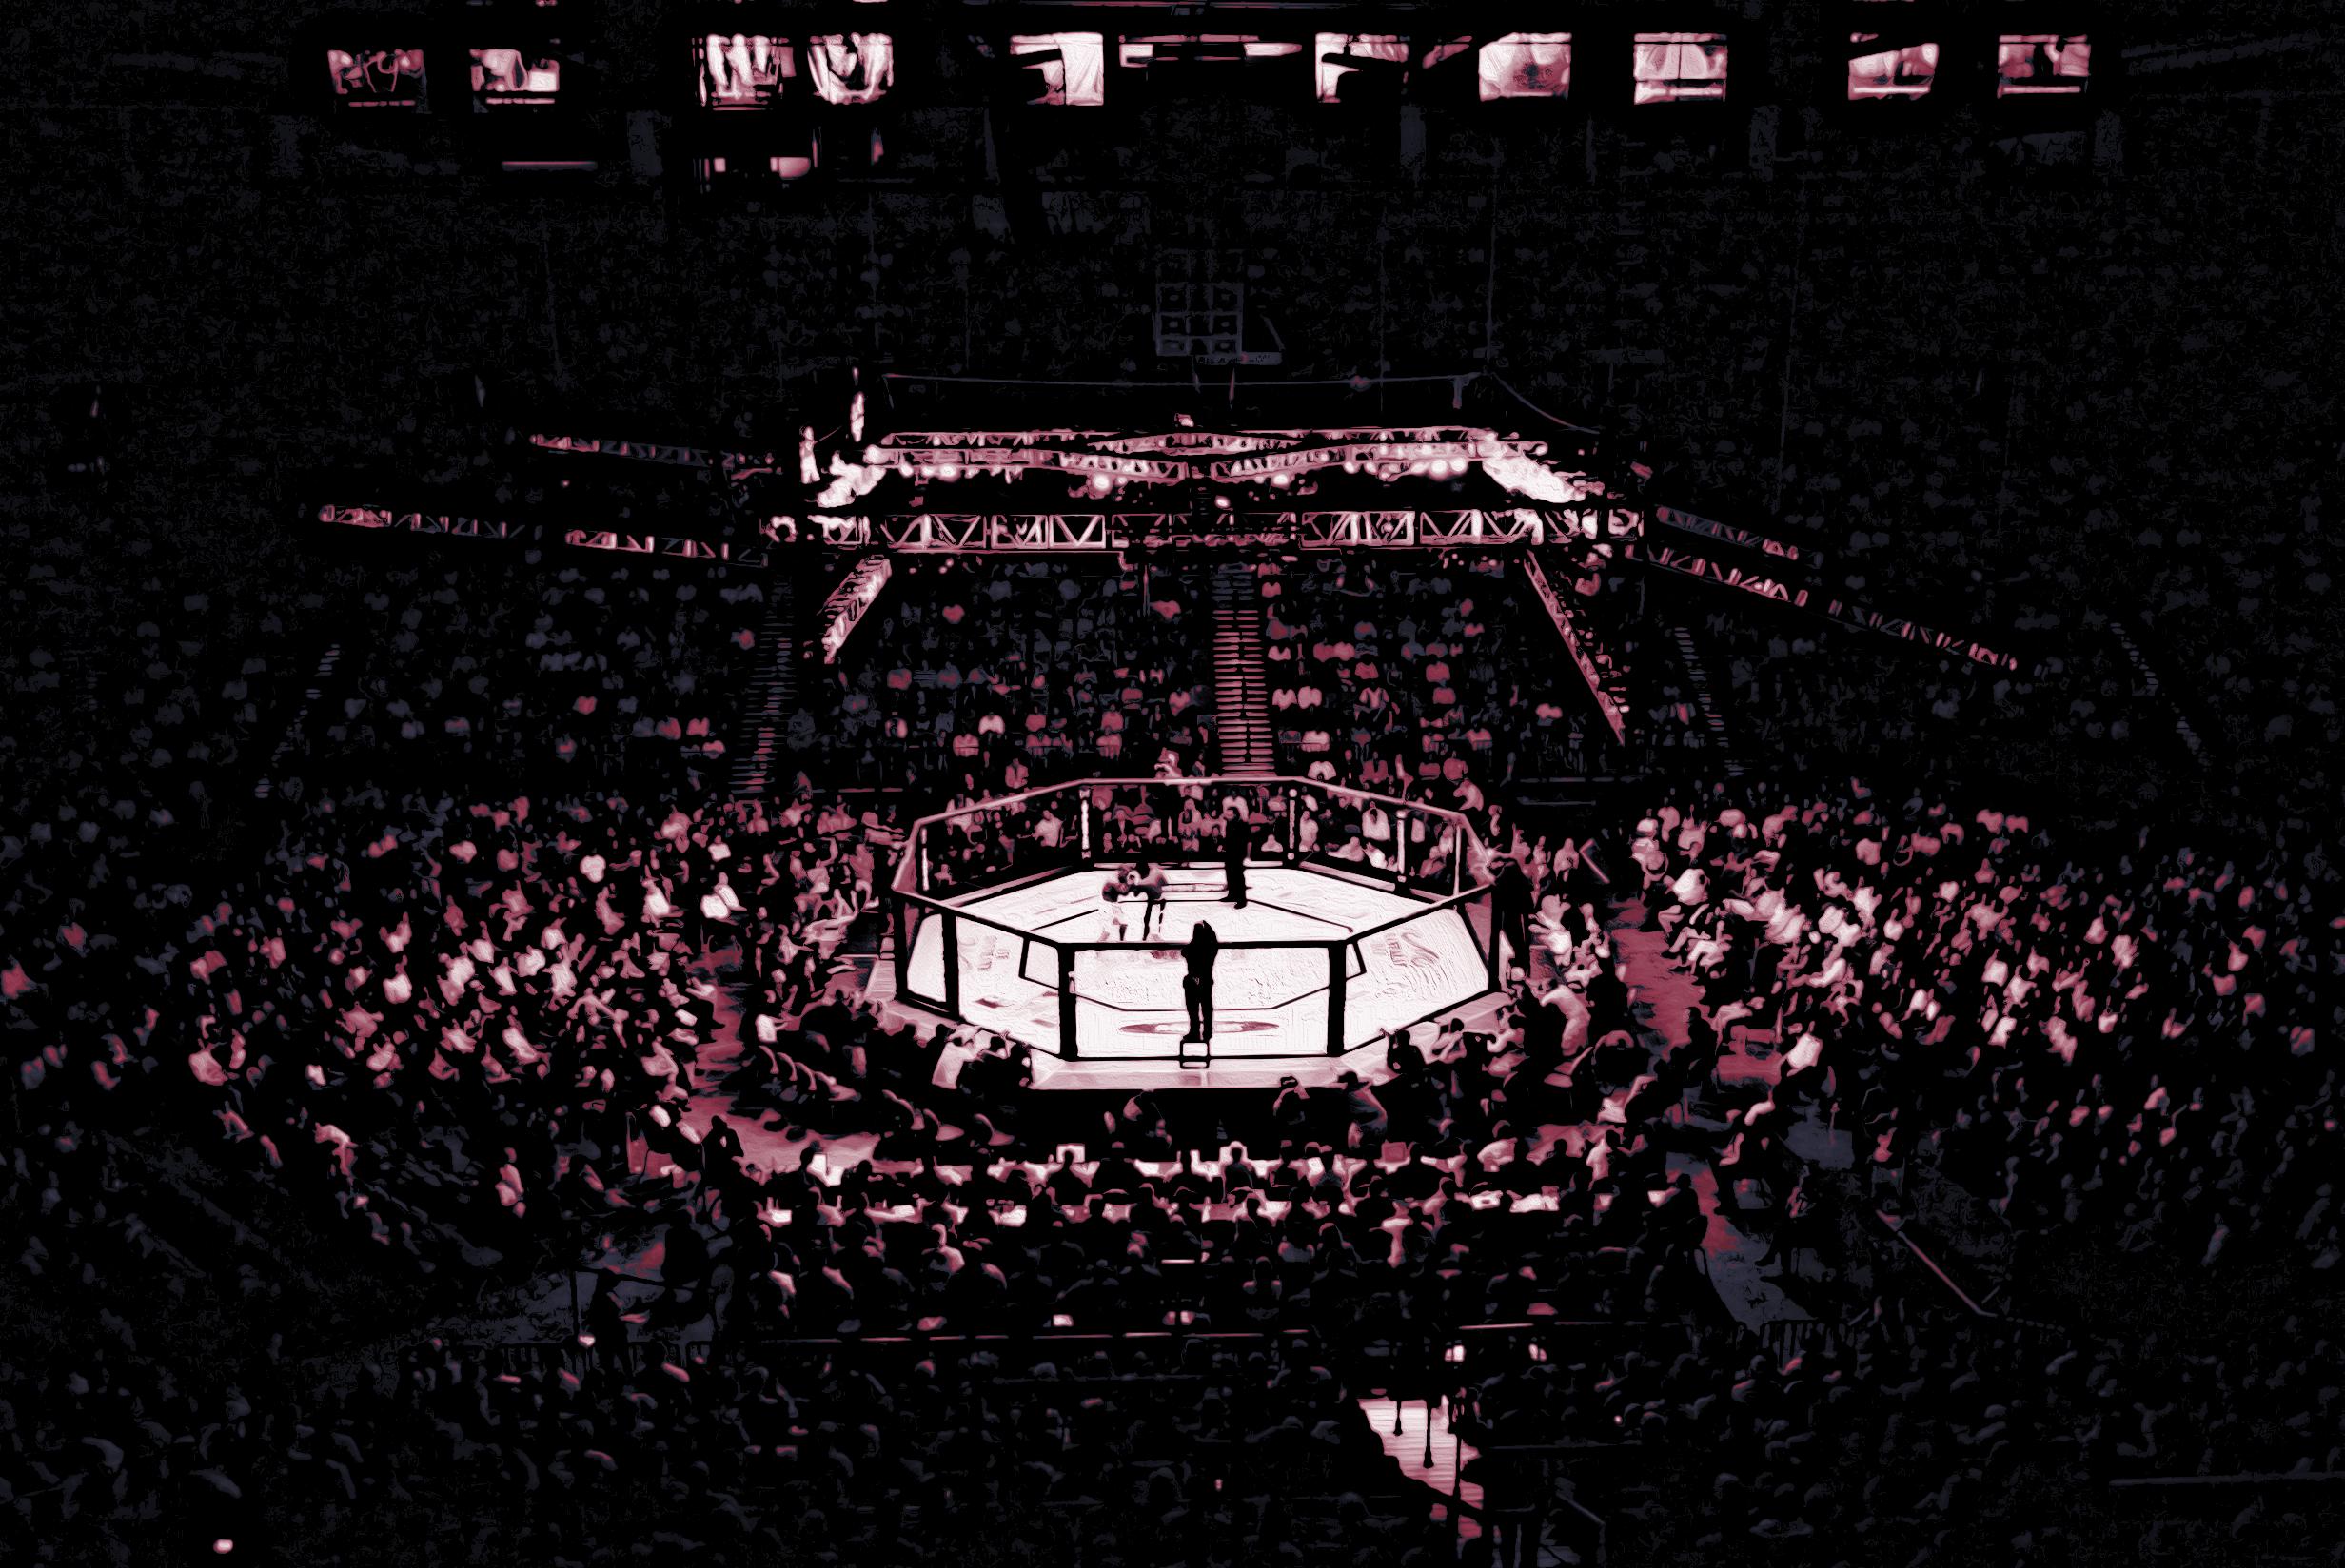 mma_arena